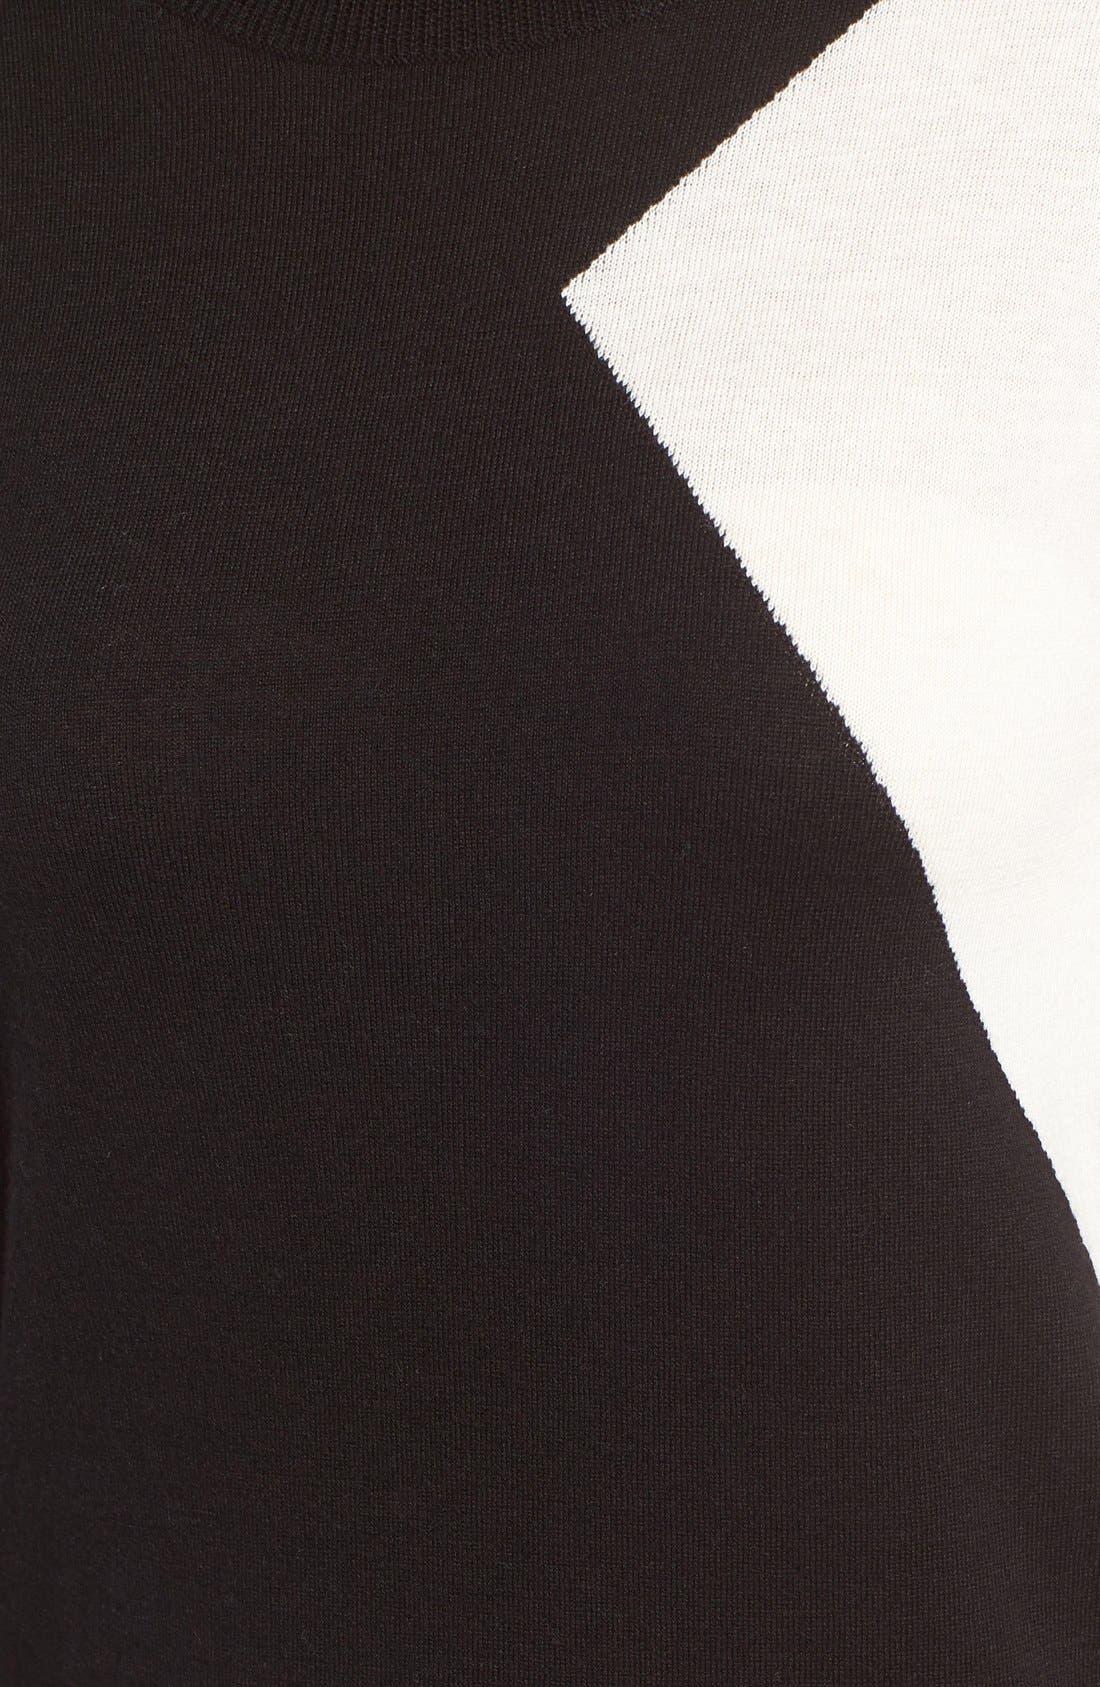 Cotton Blend Pullover,                             Alternate thumbnail 40, color,